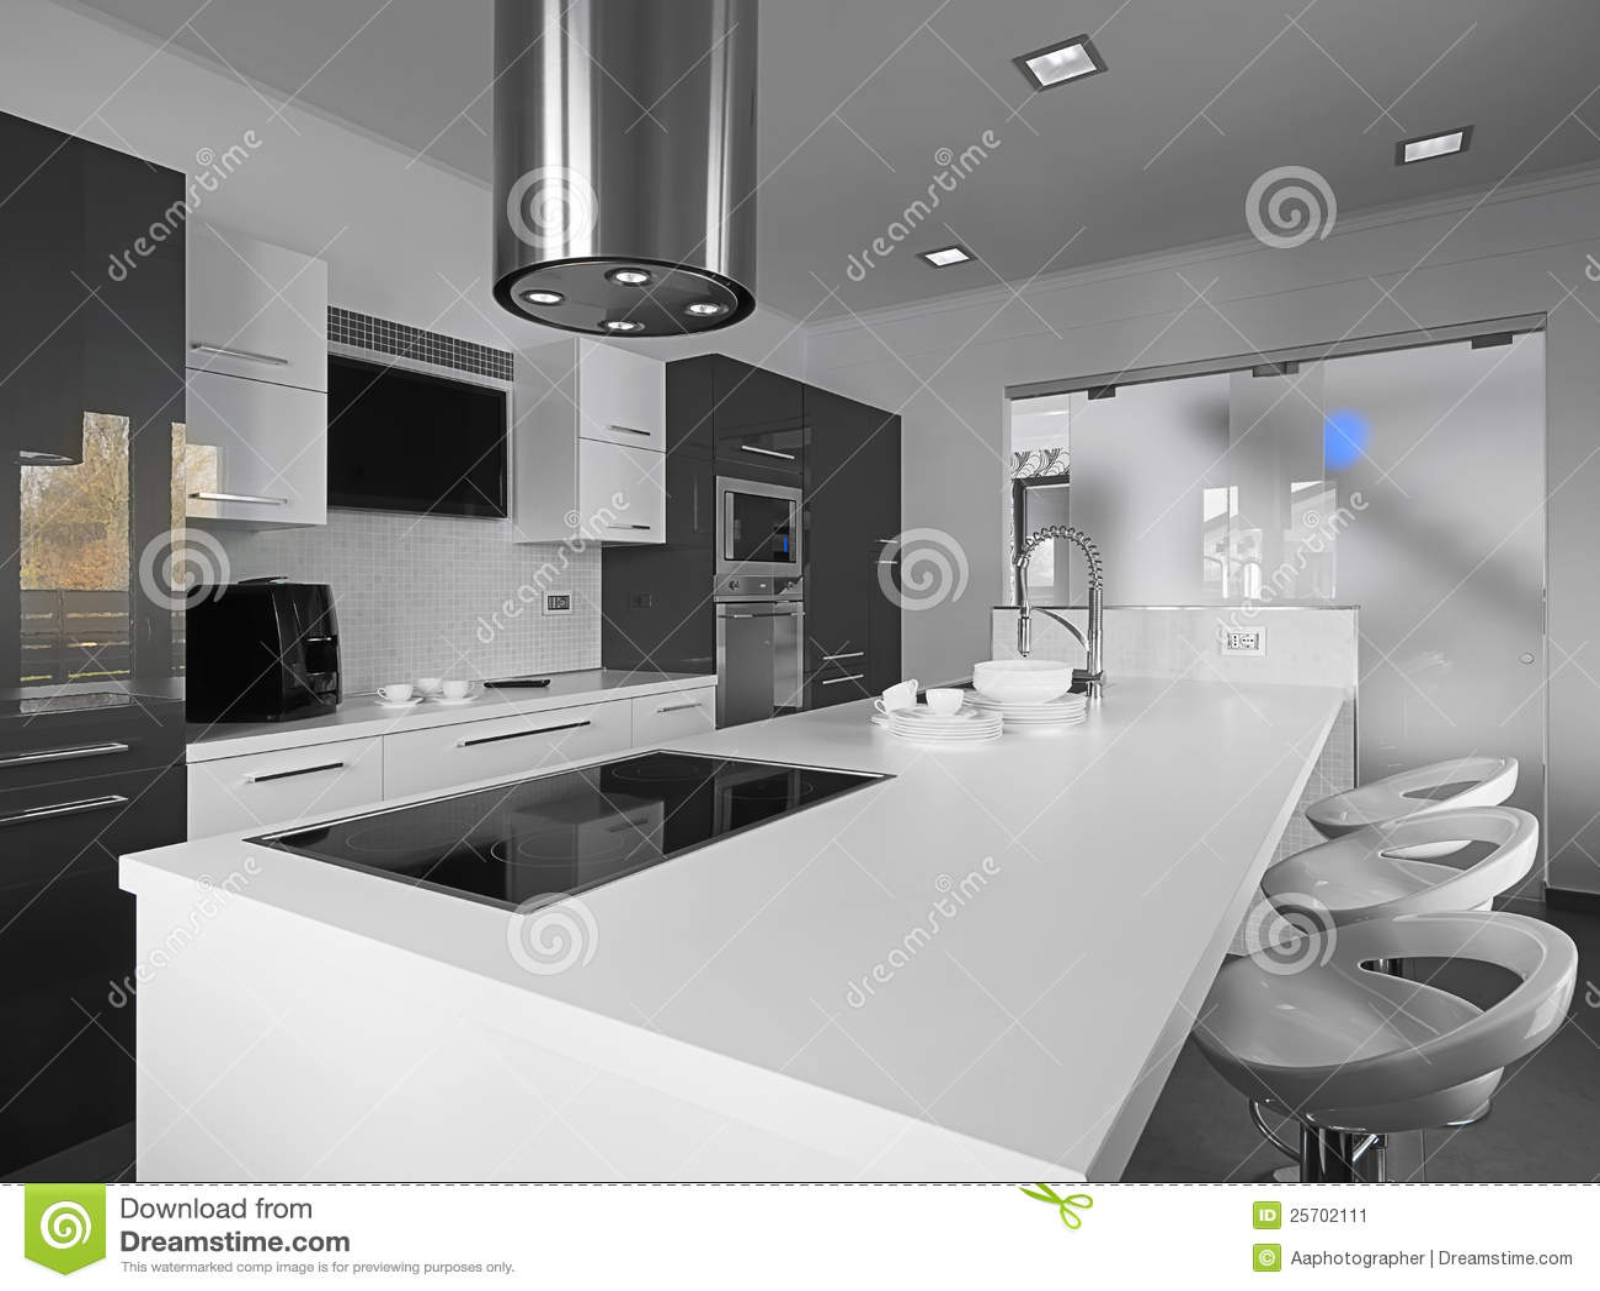 Cuisine moderne en noir et blanc image stock image 25702111 for Cuisine moderne en blanc